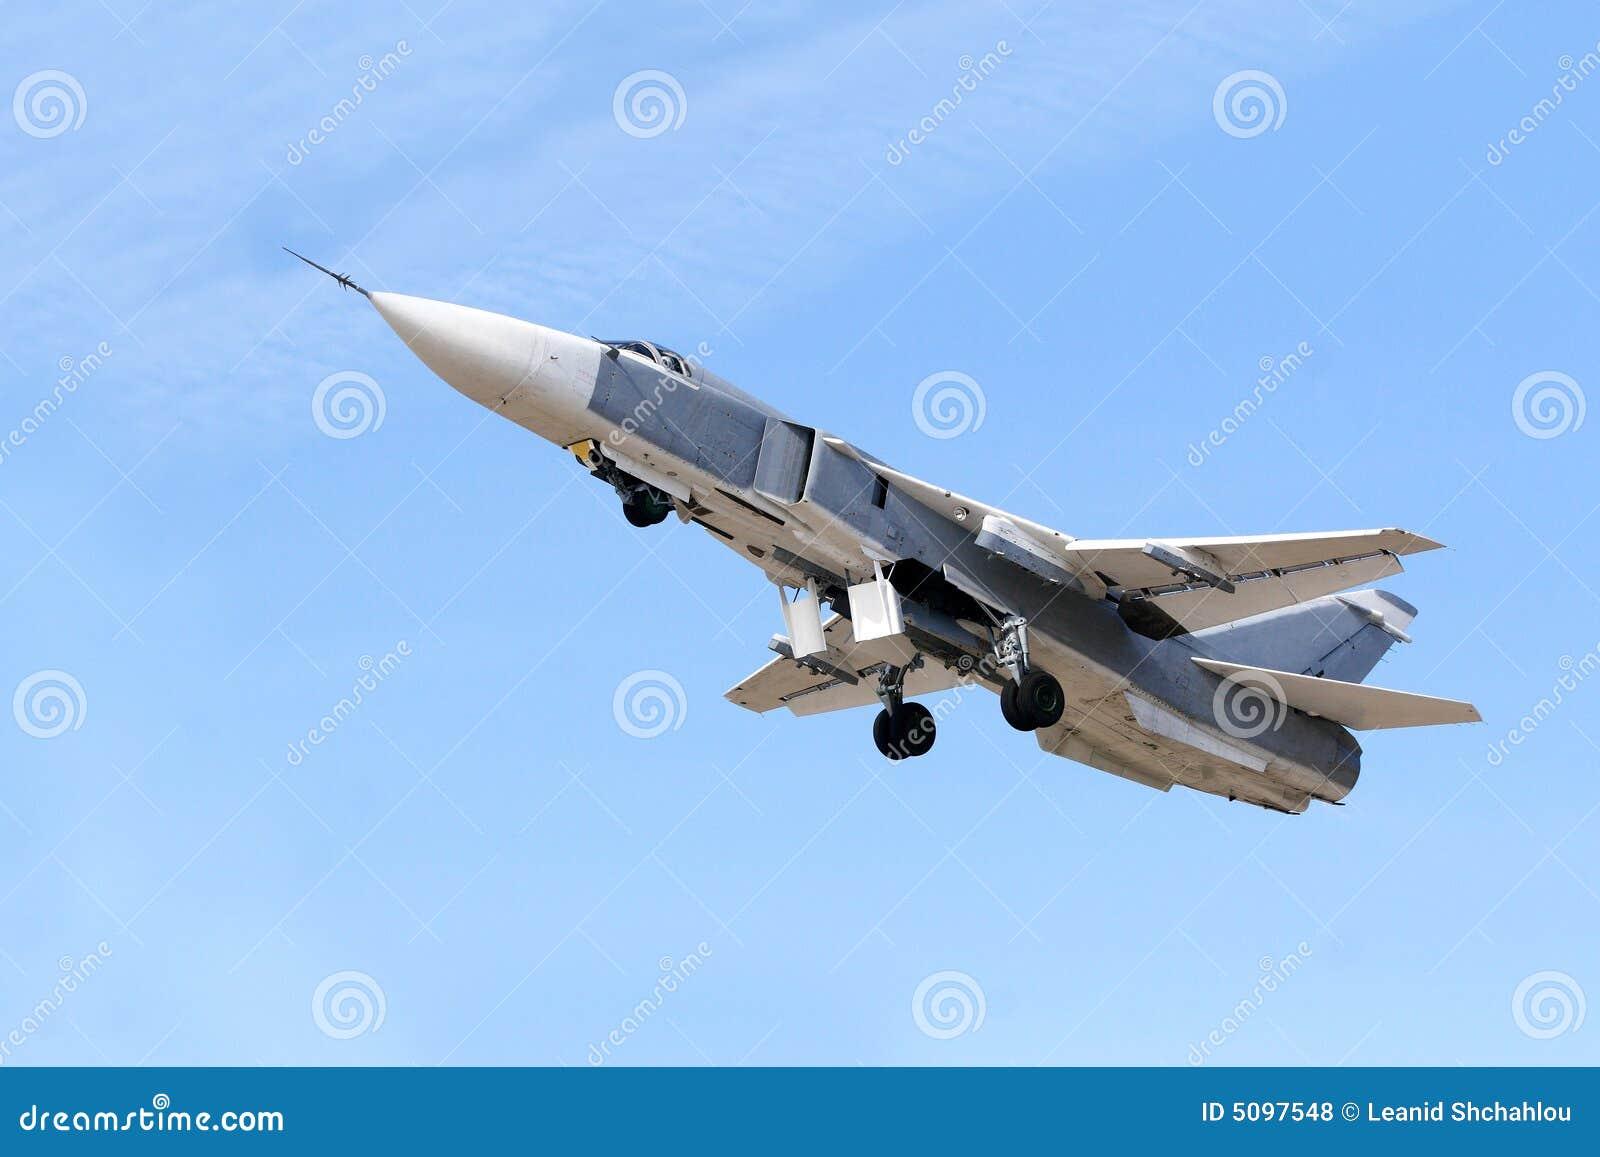 Download Jet military plane stock photo. Image of flying, burner - 5097548